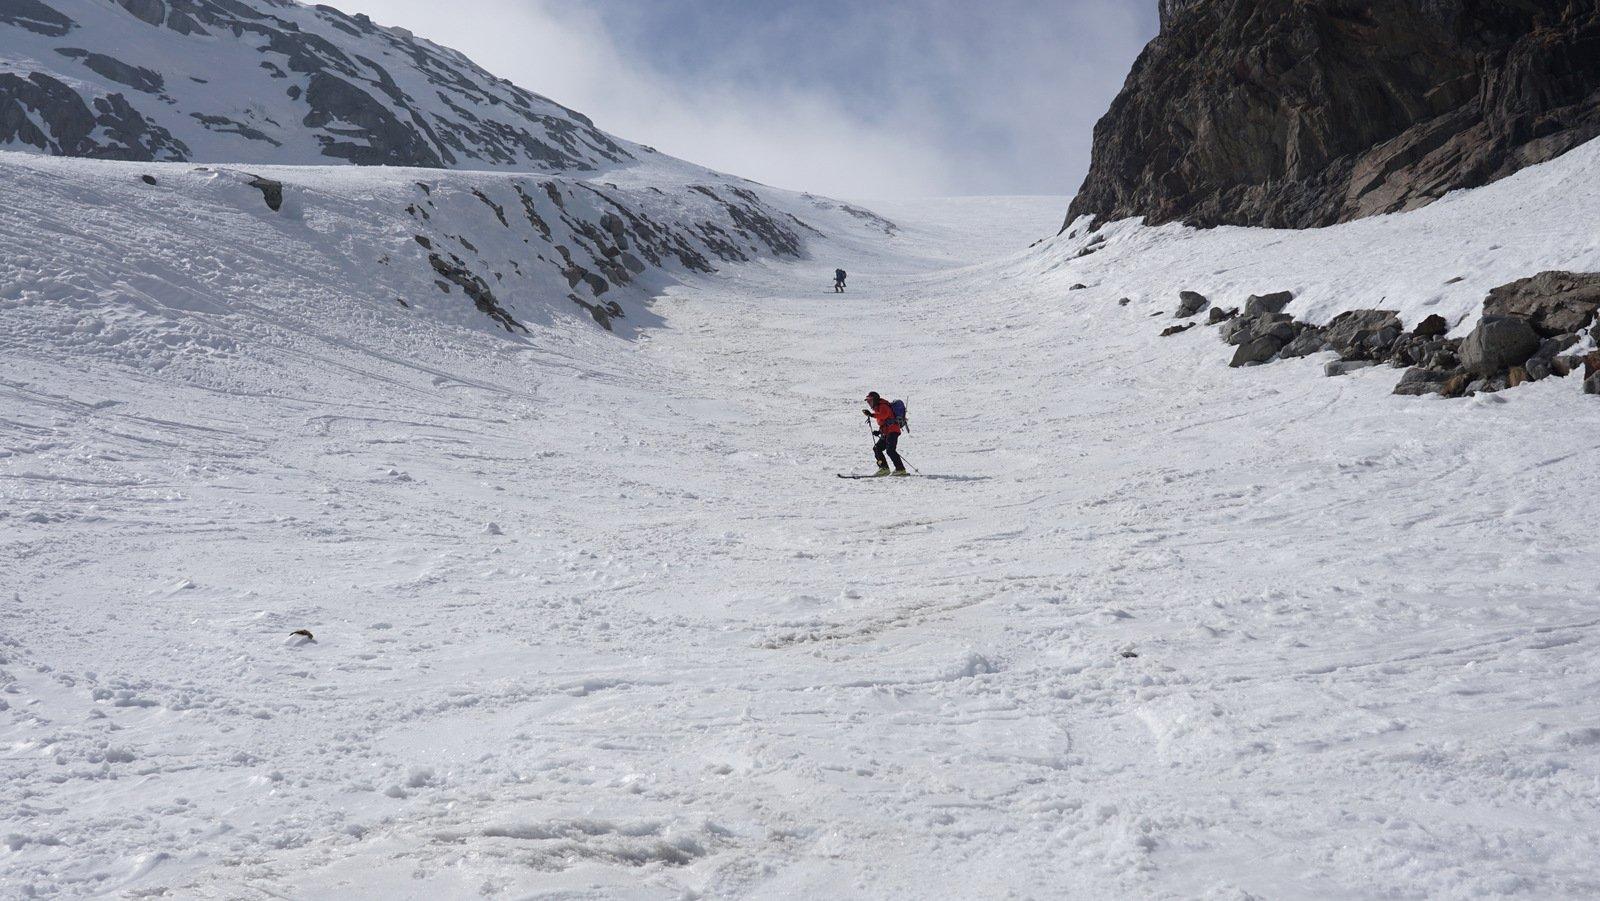 Pendii e neve super